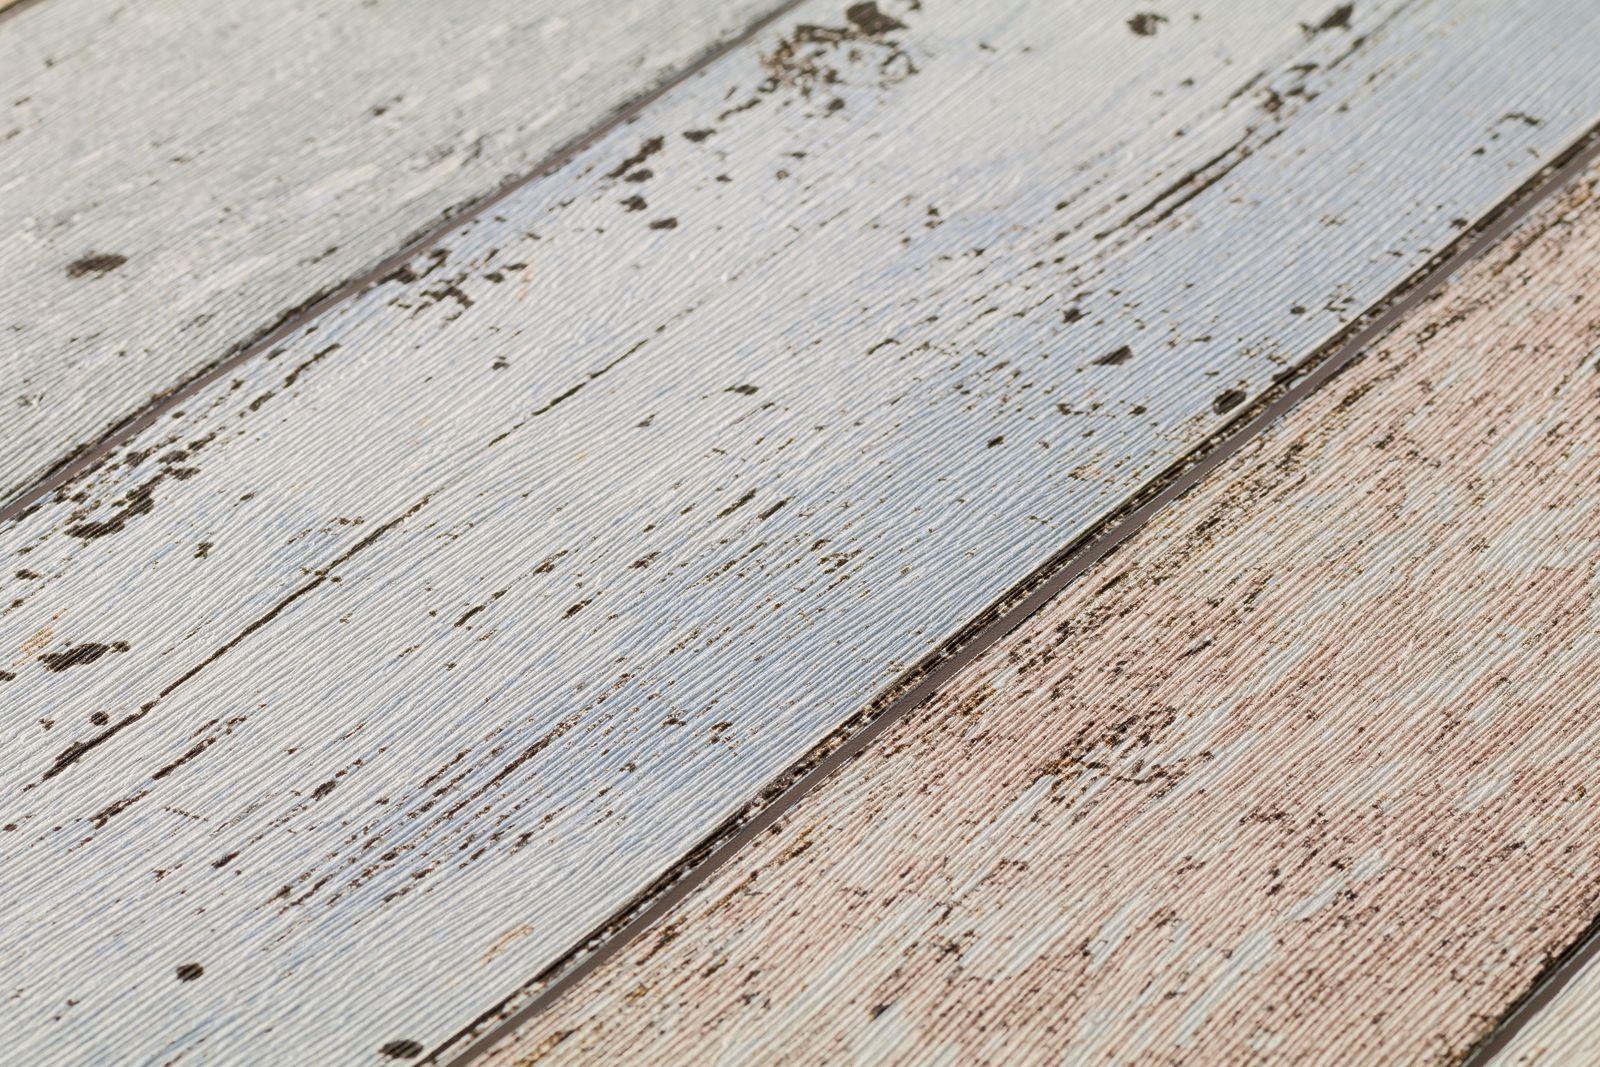 Vliestapete Holz-Optik Planken beige grau AS Creation 8550-39 2,41€//1qm